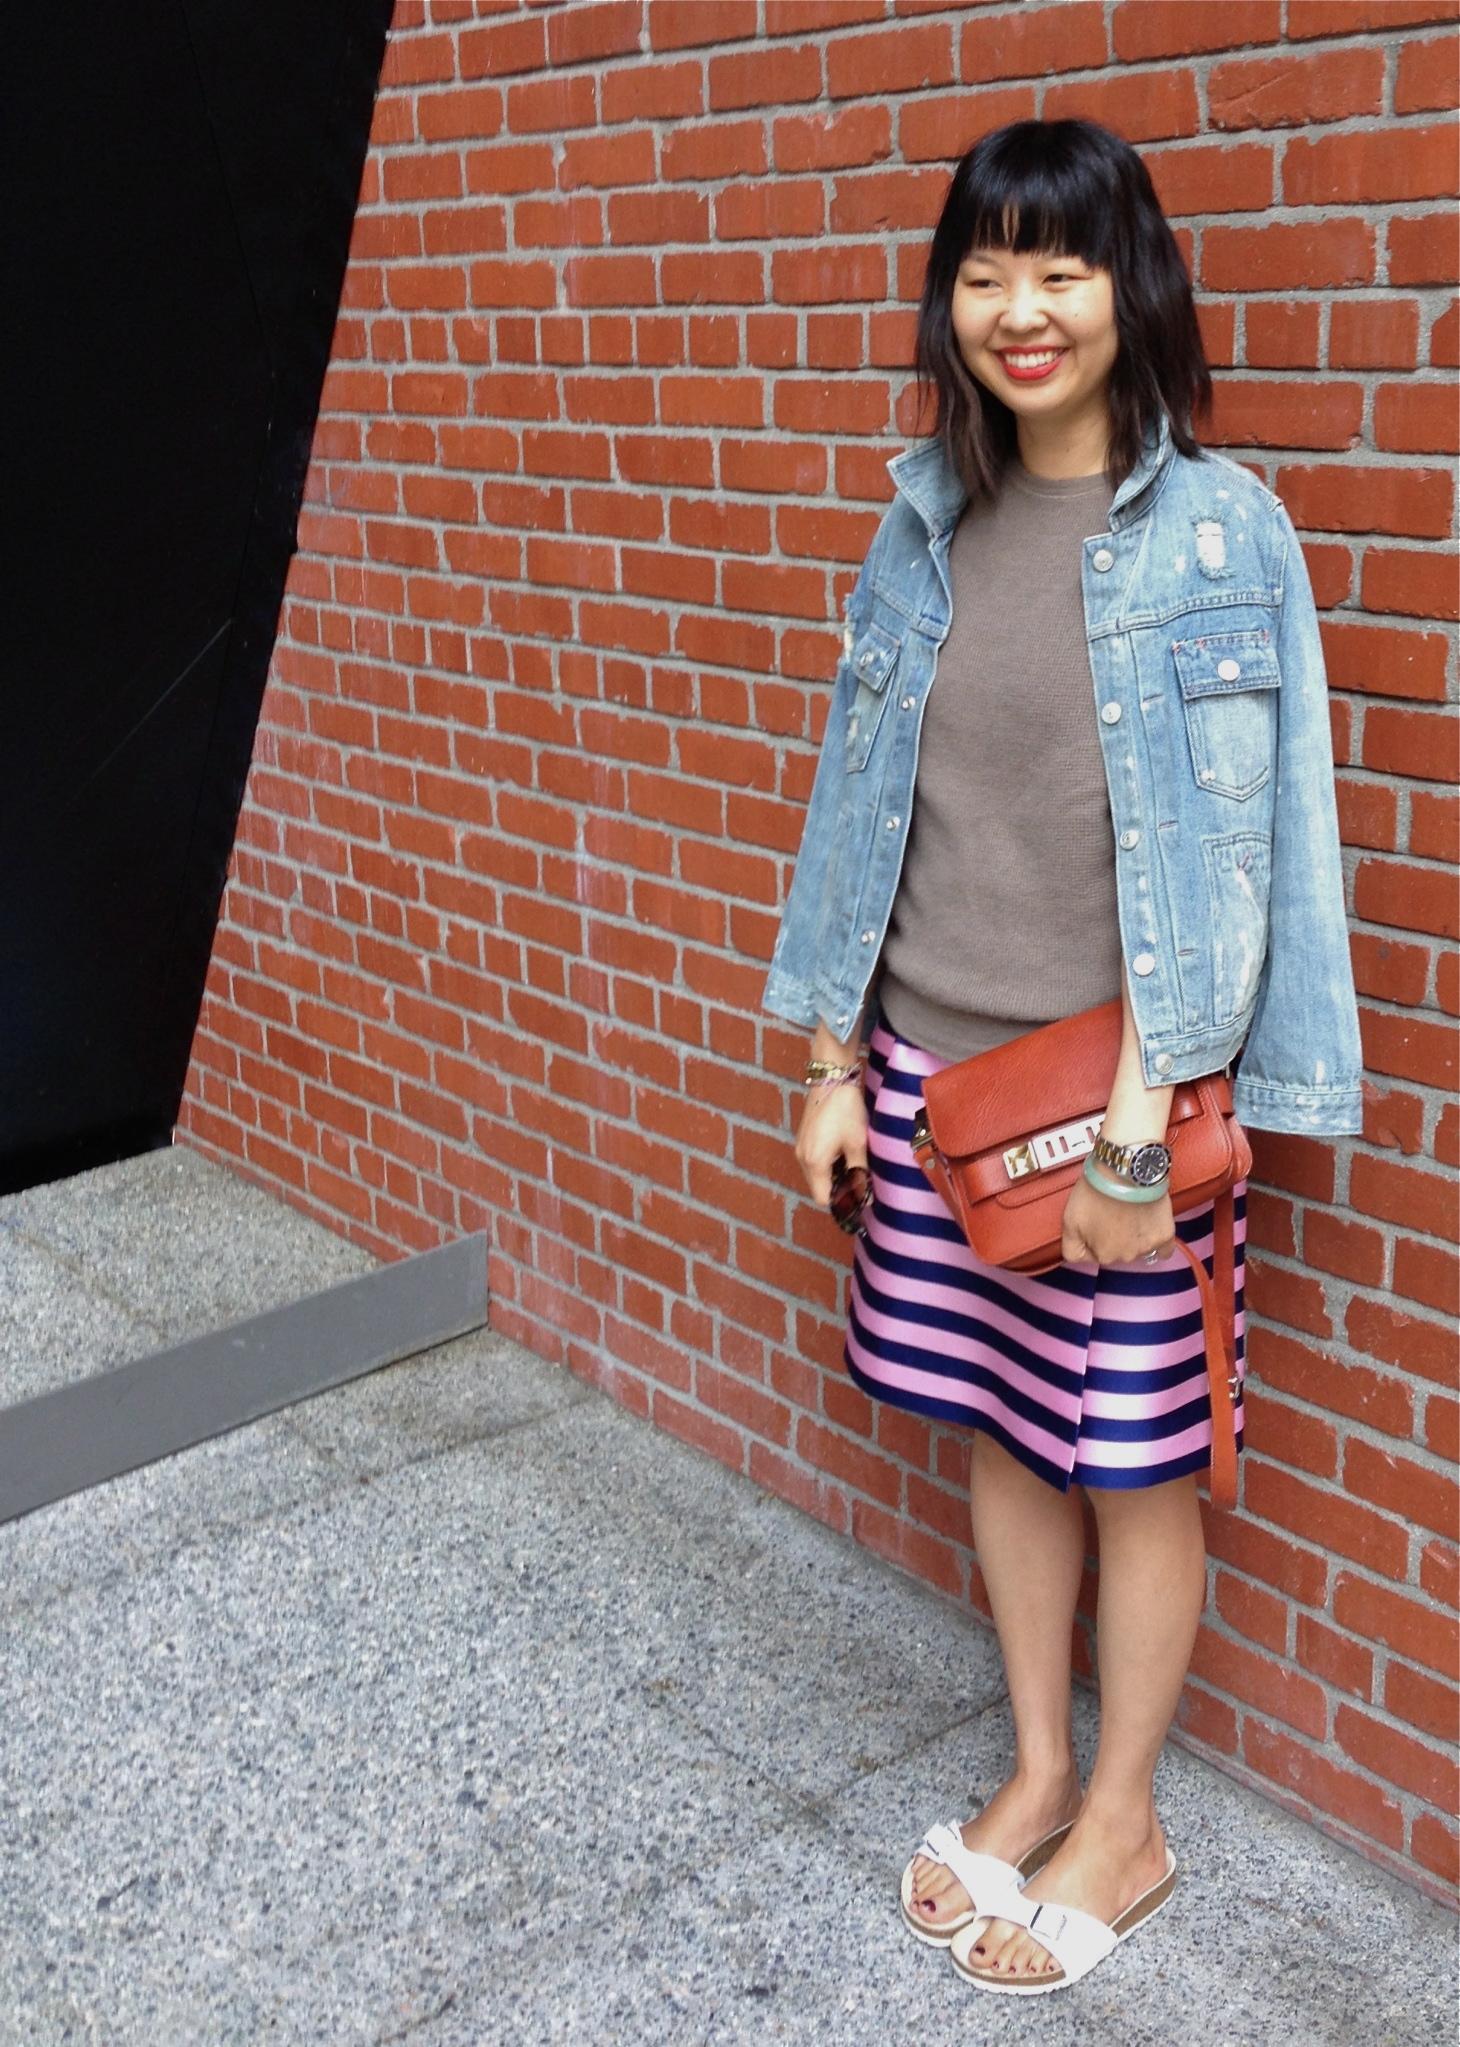 b4a20fc8aa4 ... distressed denim jacket over satin stripe skirt and white birkenstocks